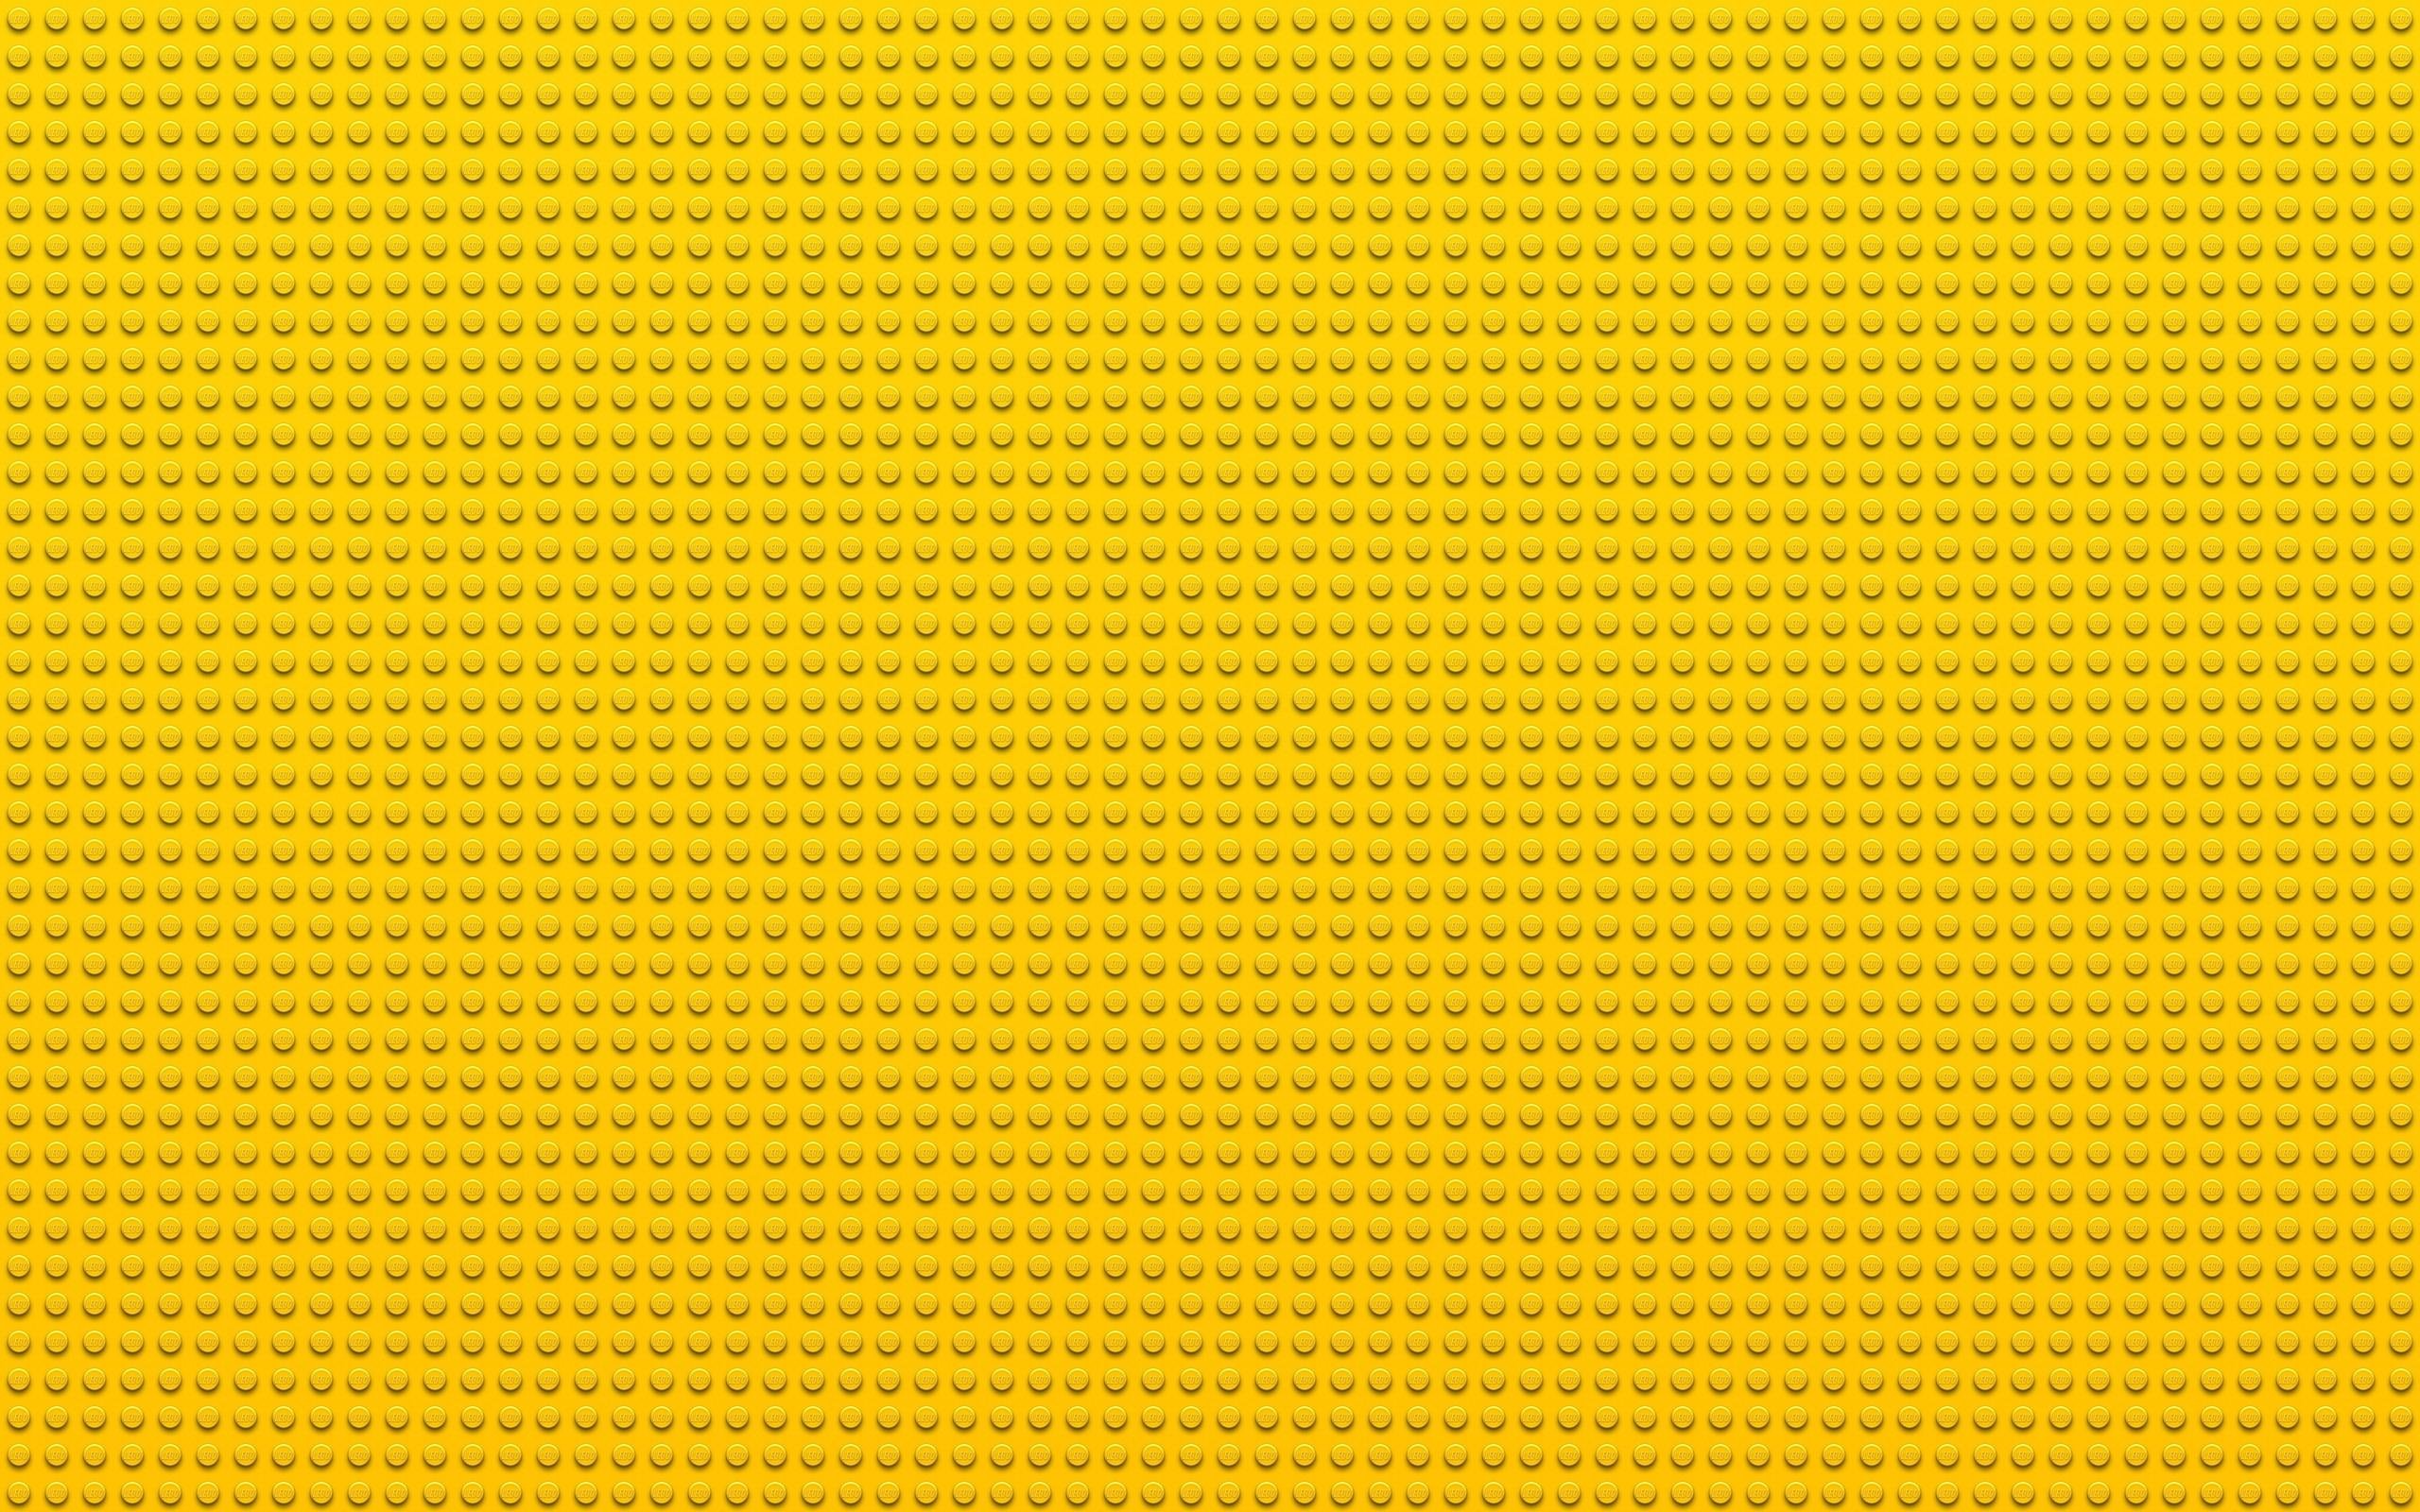 Hintergrundbilder : Gelb, LEGO, Muster, Textur, Winkel